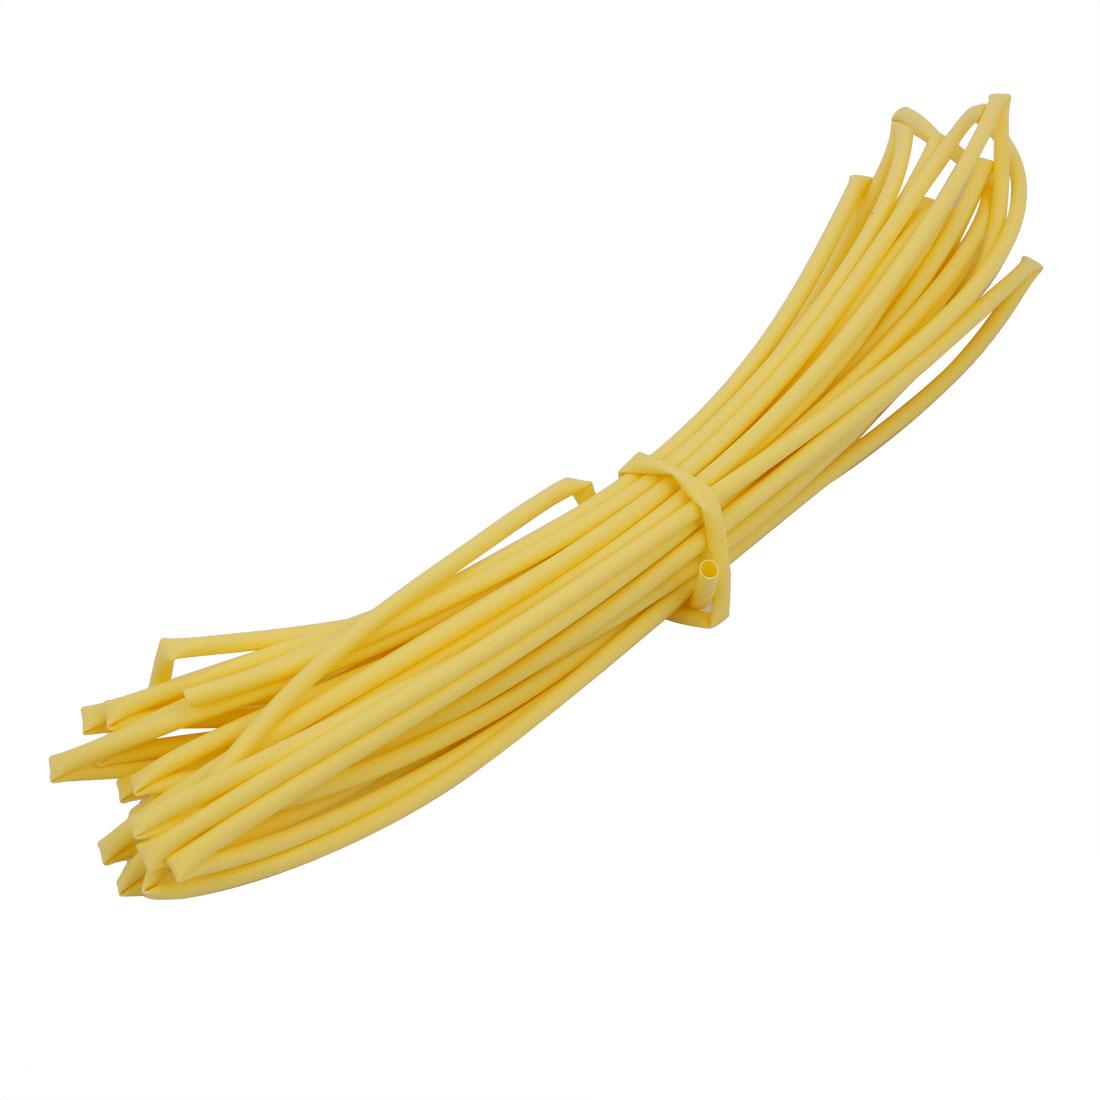 6M 0.06in Inner Dia Polyolefin Flame Retardant Tube Yellow for Wire Repairing